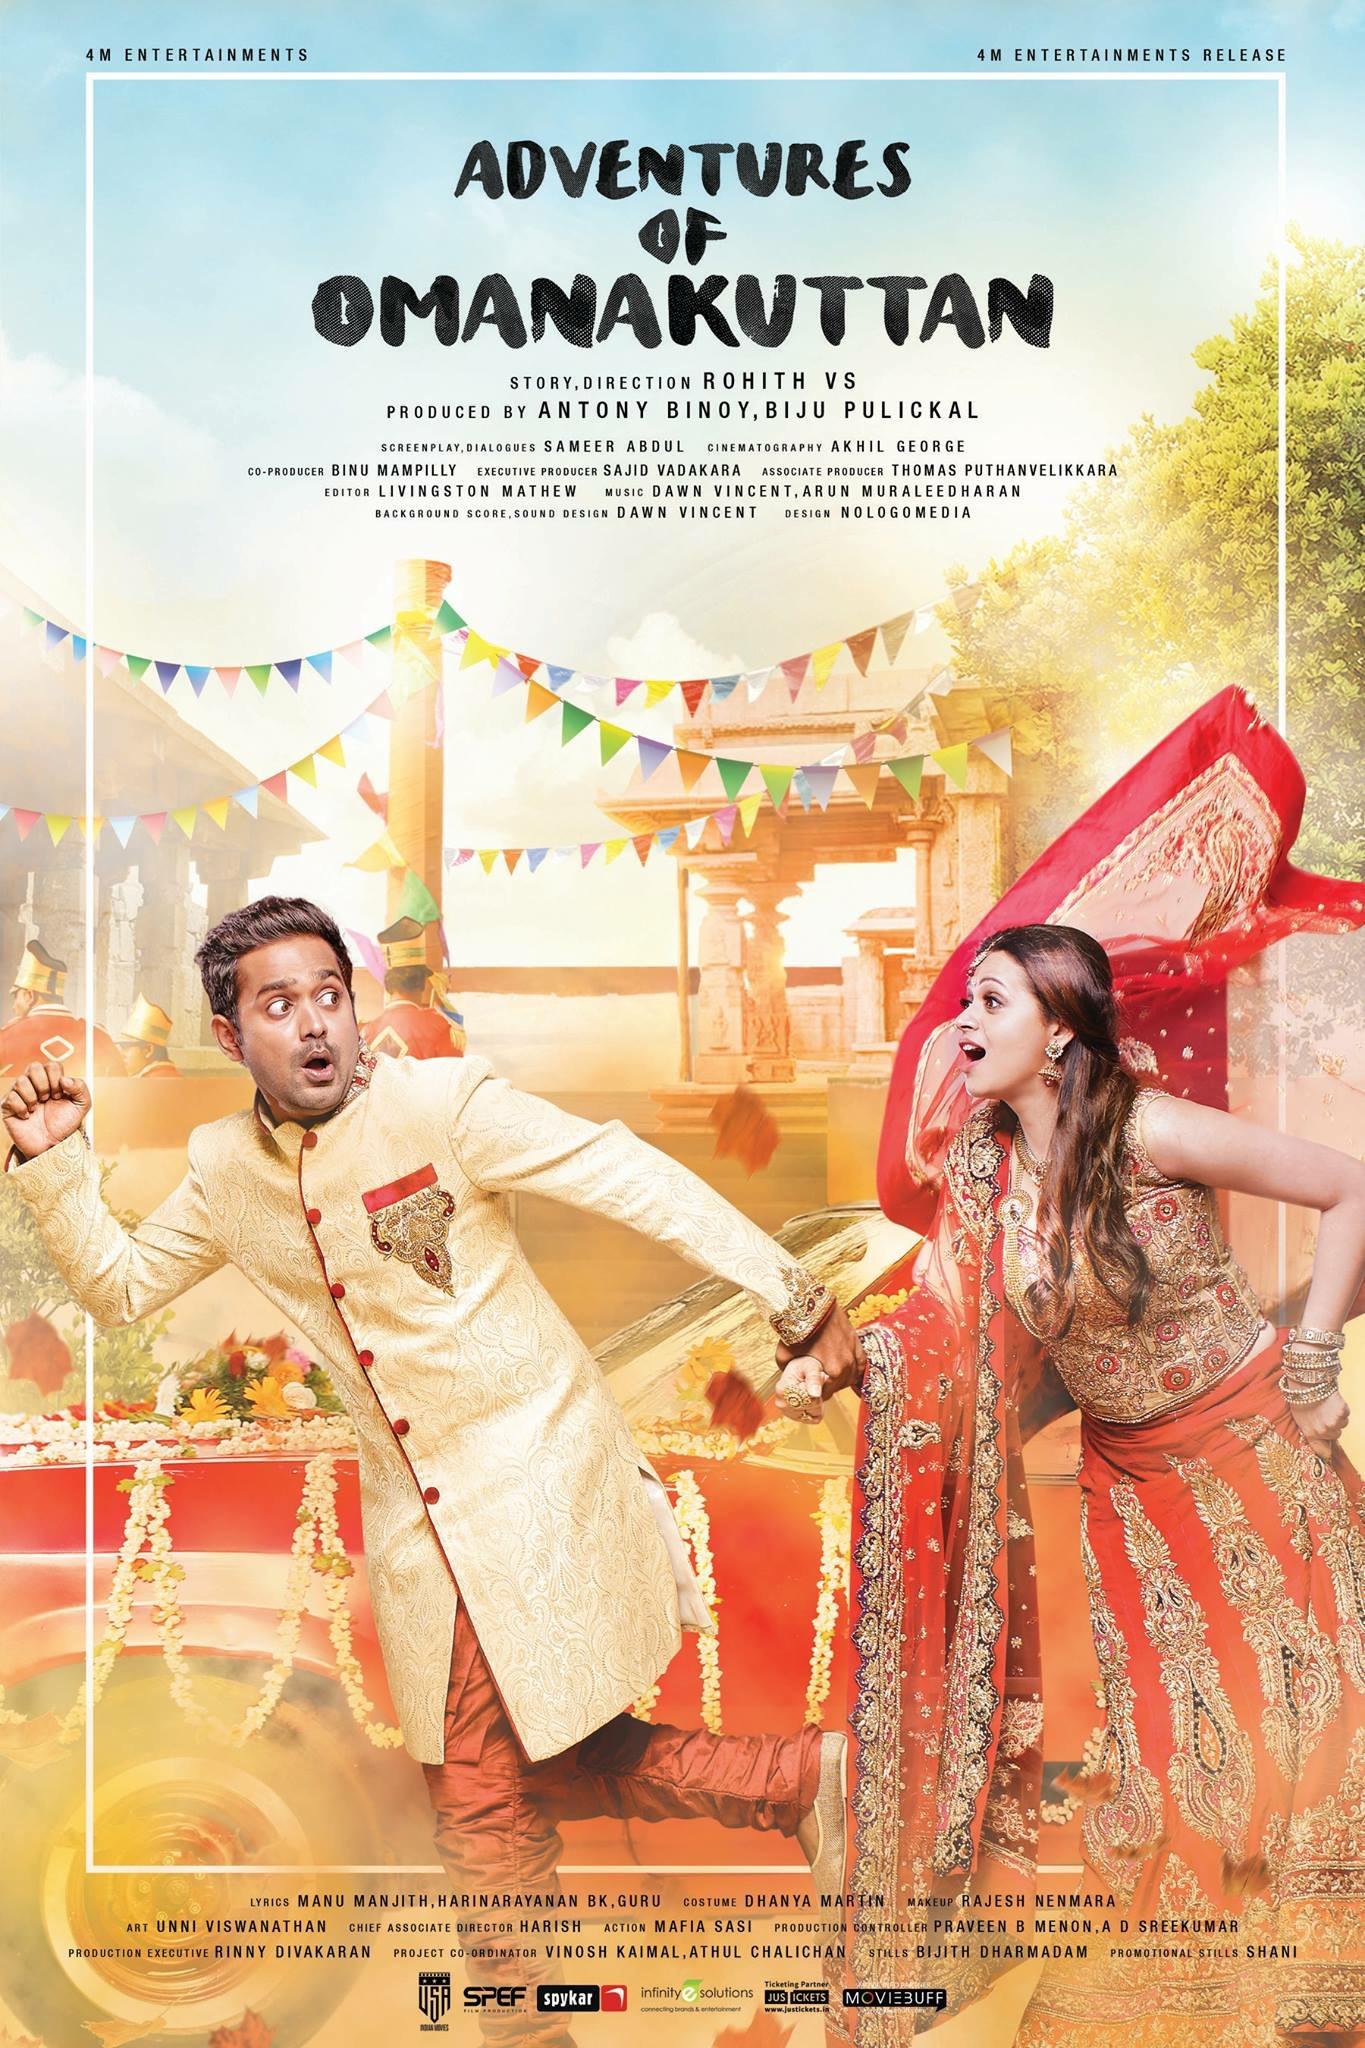 Adventures of Omanakuttan 2017 Dual Audio Hindi 720p UNCUT HDRip 1.7GB Download